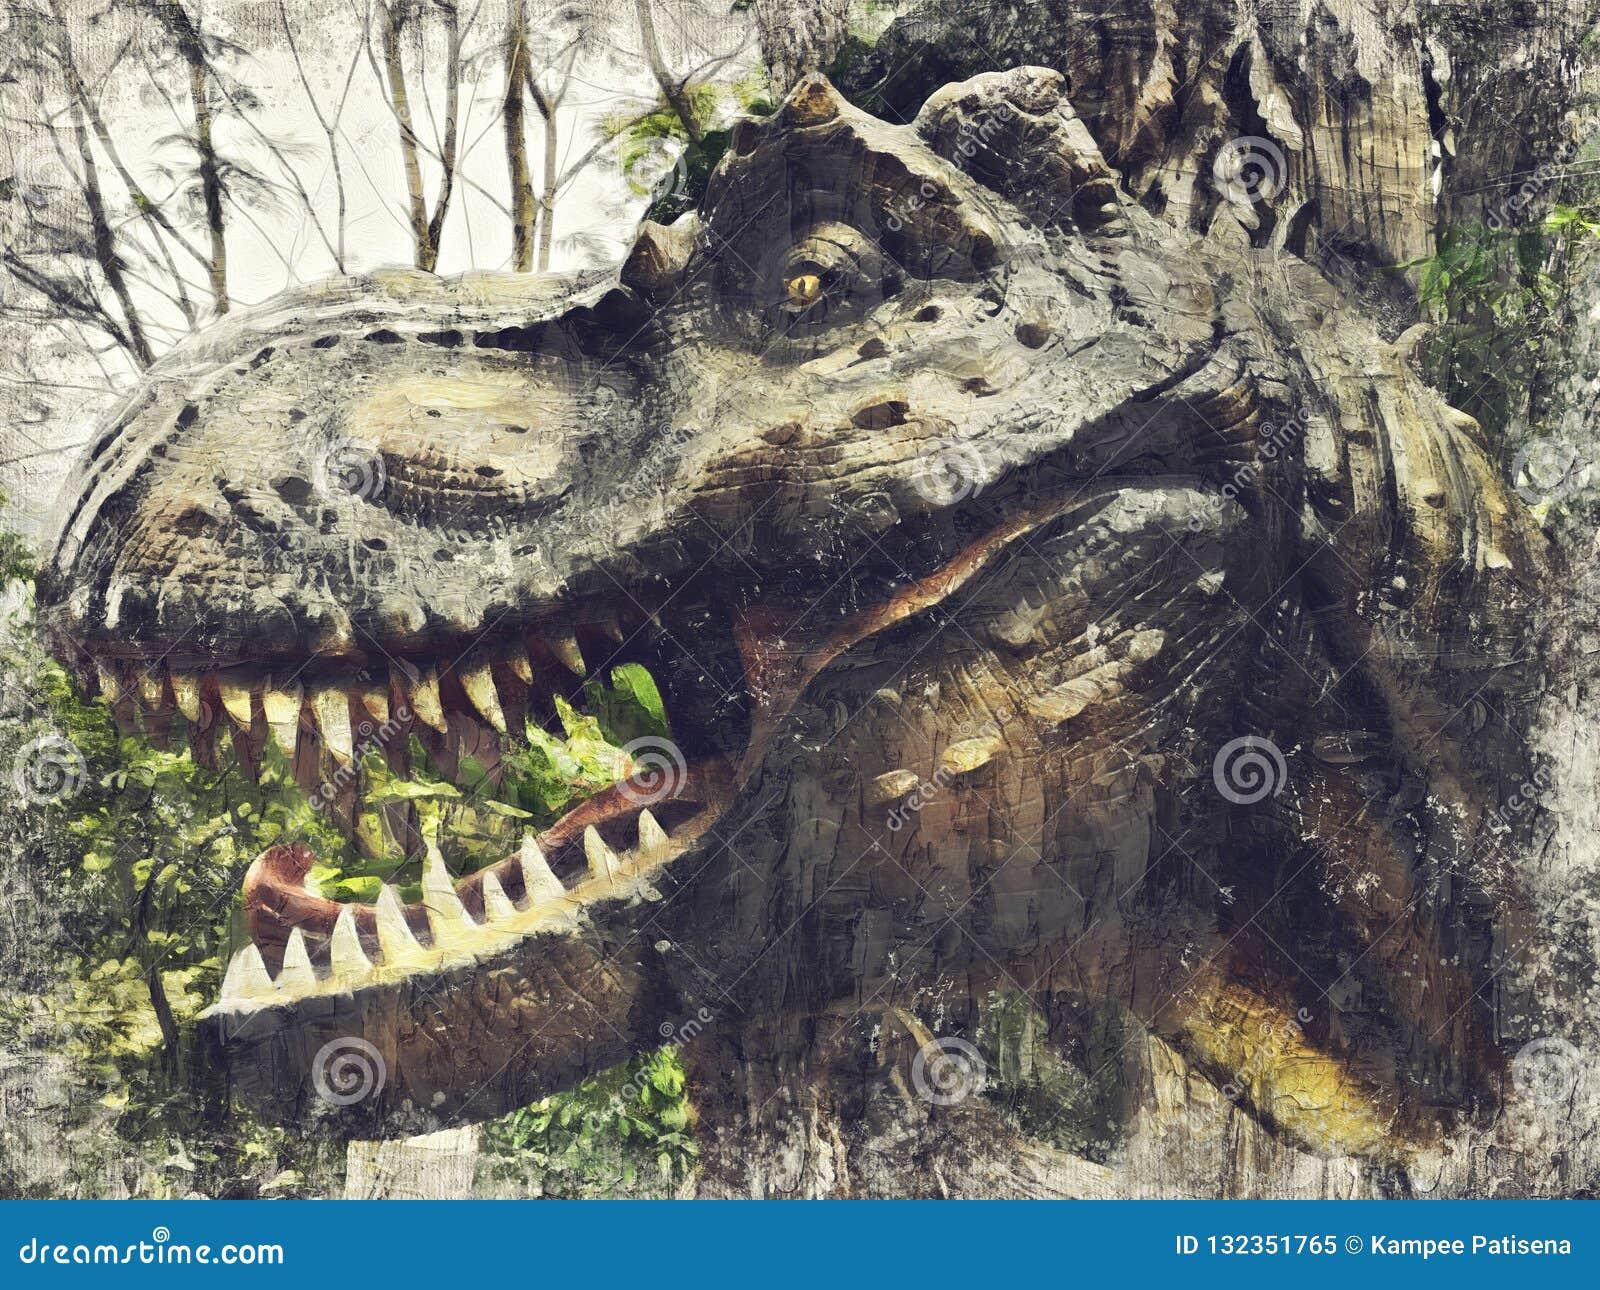 Tirannosauro Rex, T-REX Digital Art Impasto Oil Painting Abstr